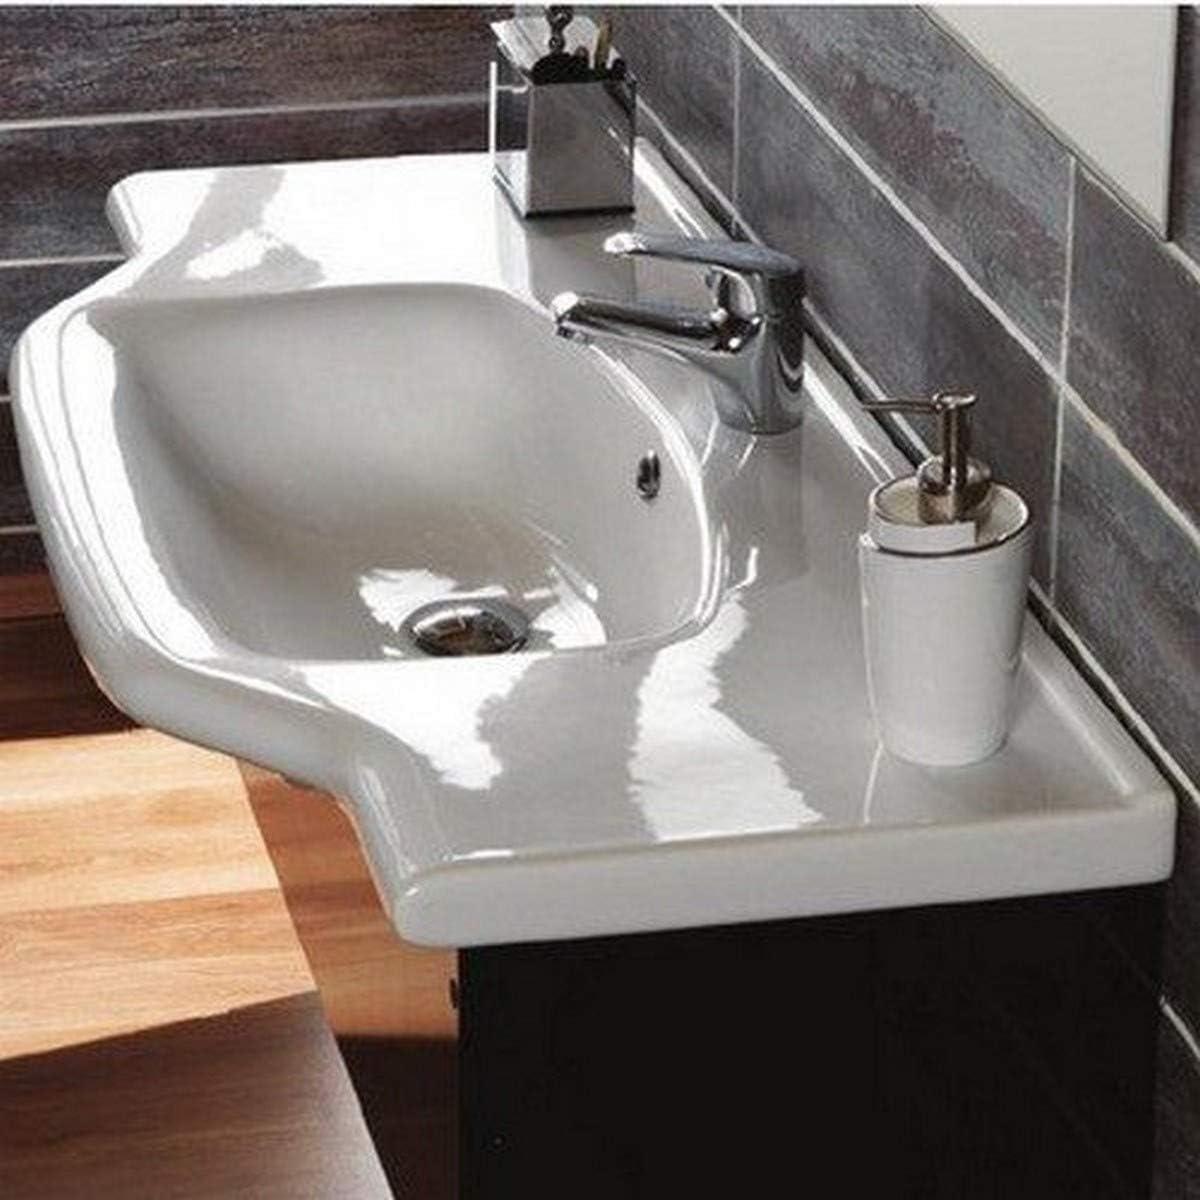 Buy Cerastyle 081200 U One Hole Yeni Klasik Rectangular Ceramic Wall Mounted Self Rimming Bathroom Sink White Online In Hong Kong B00iynqjqy